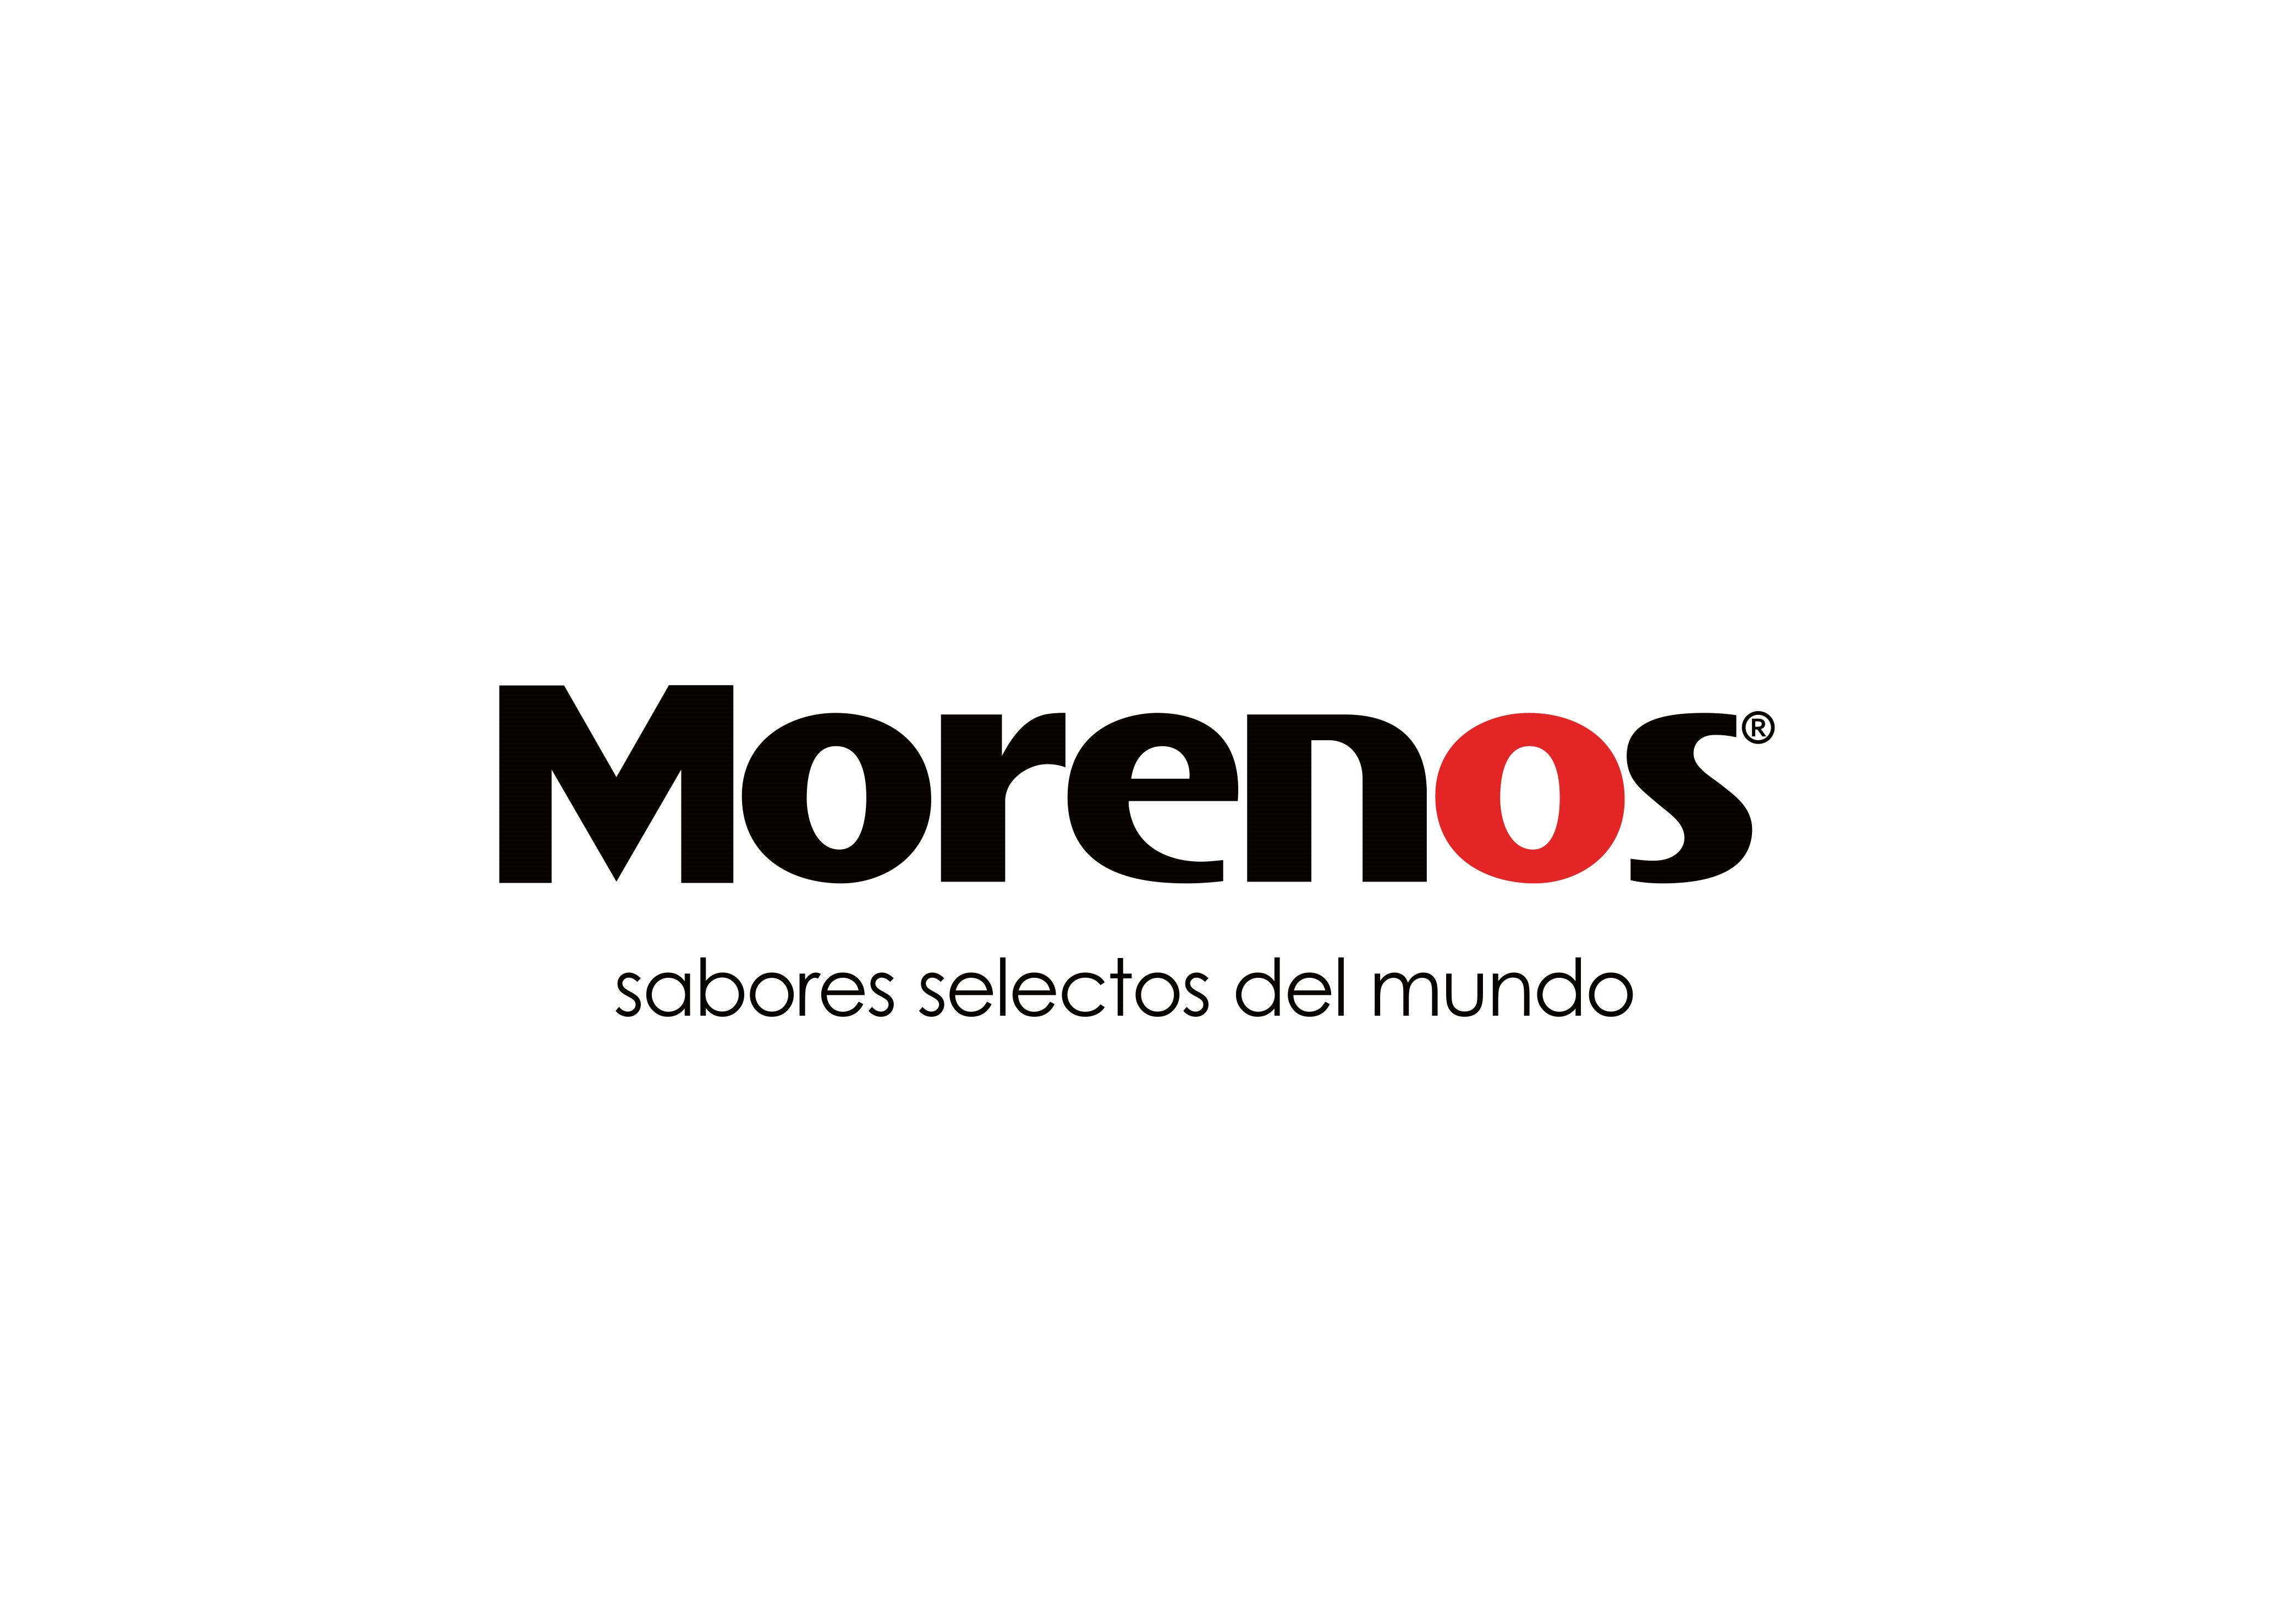 Morenos SAS